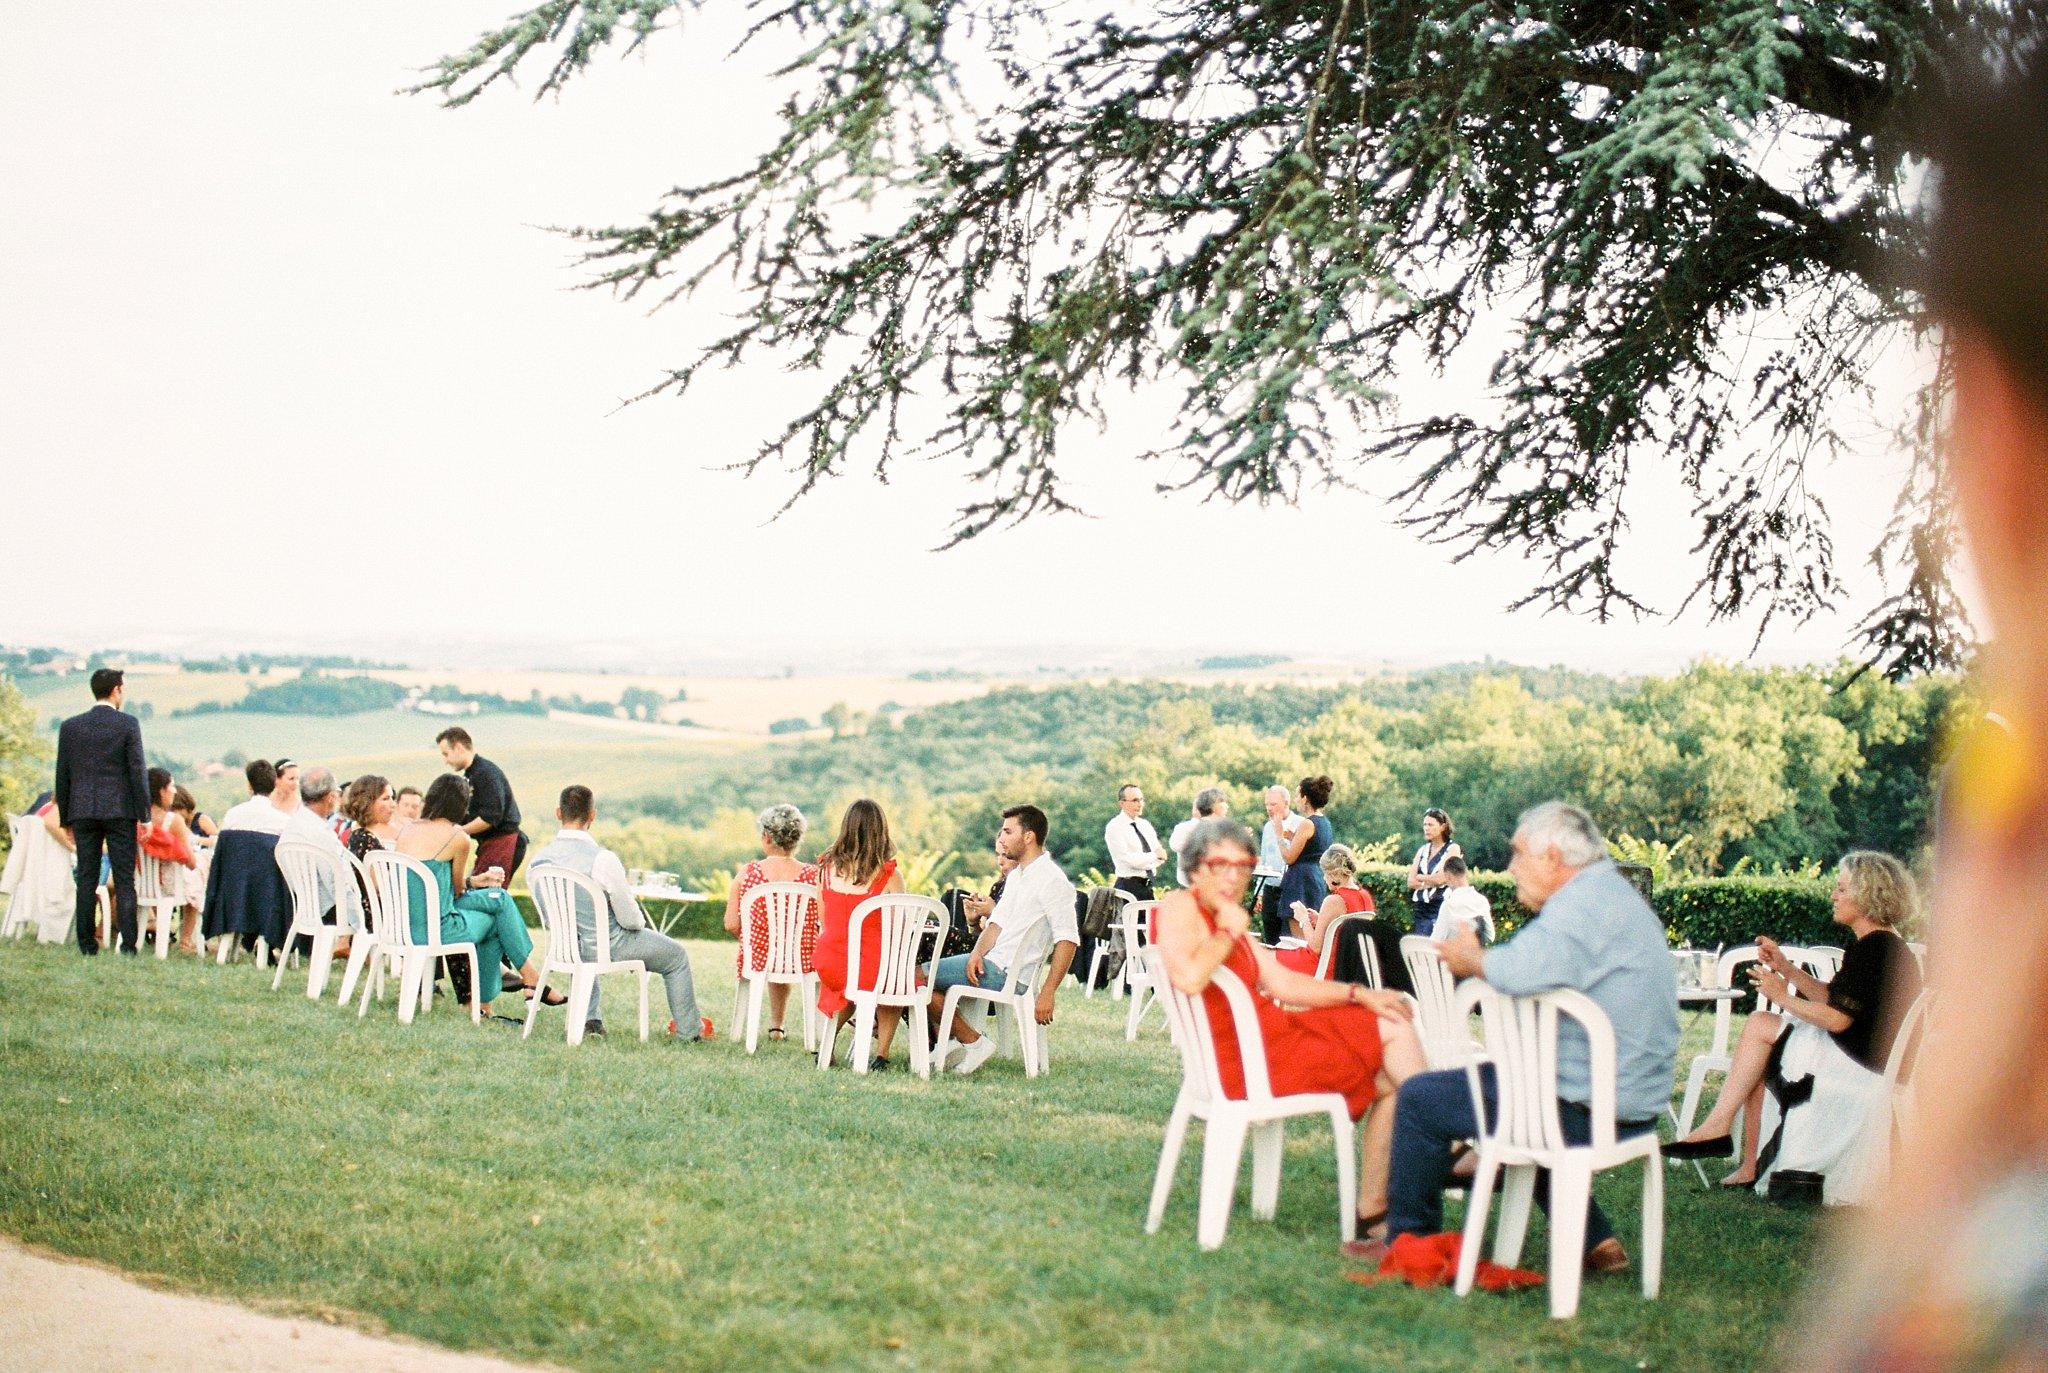 Mariage-a-la-maison-secall-hugo-hennequin-photographe-mariage-perpignan_0113.jpg